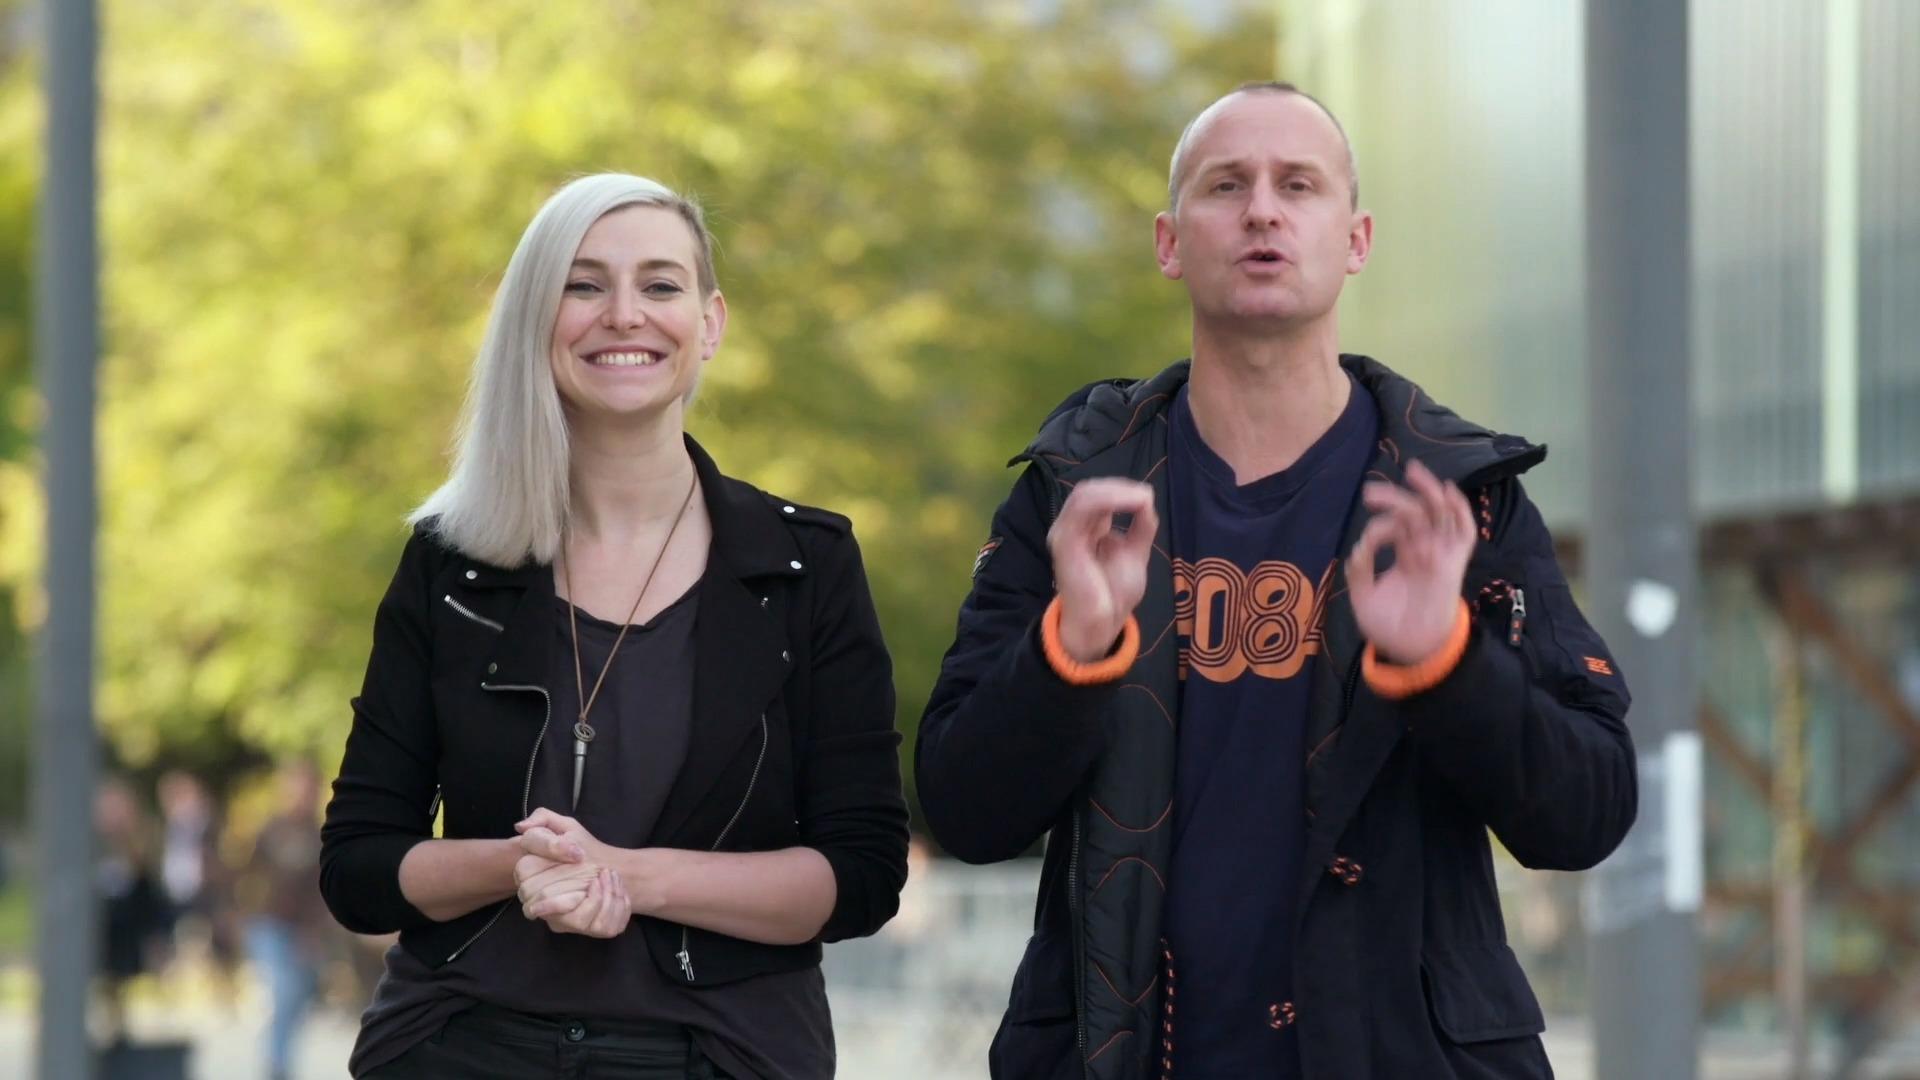 Xxx videa v saree